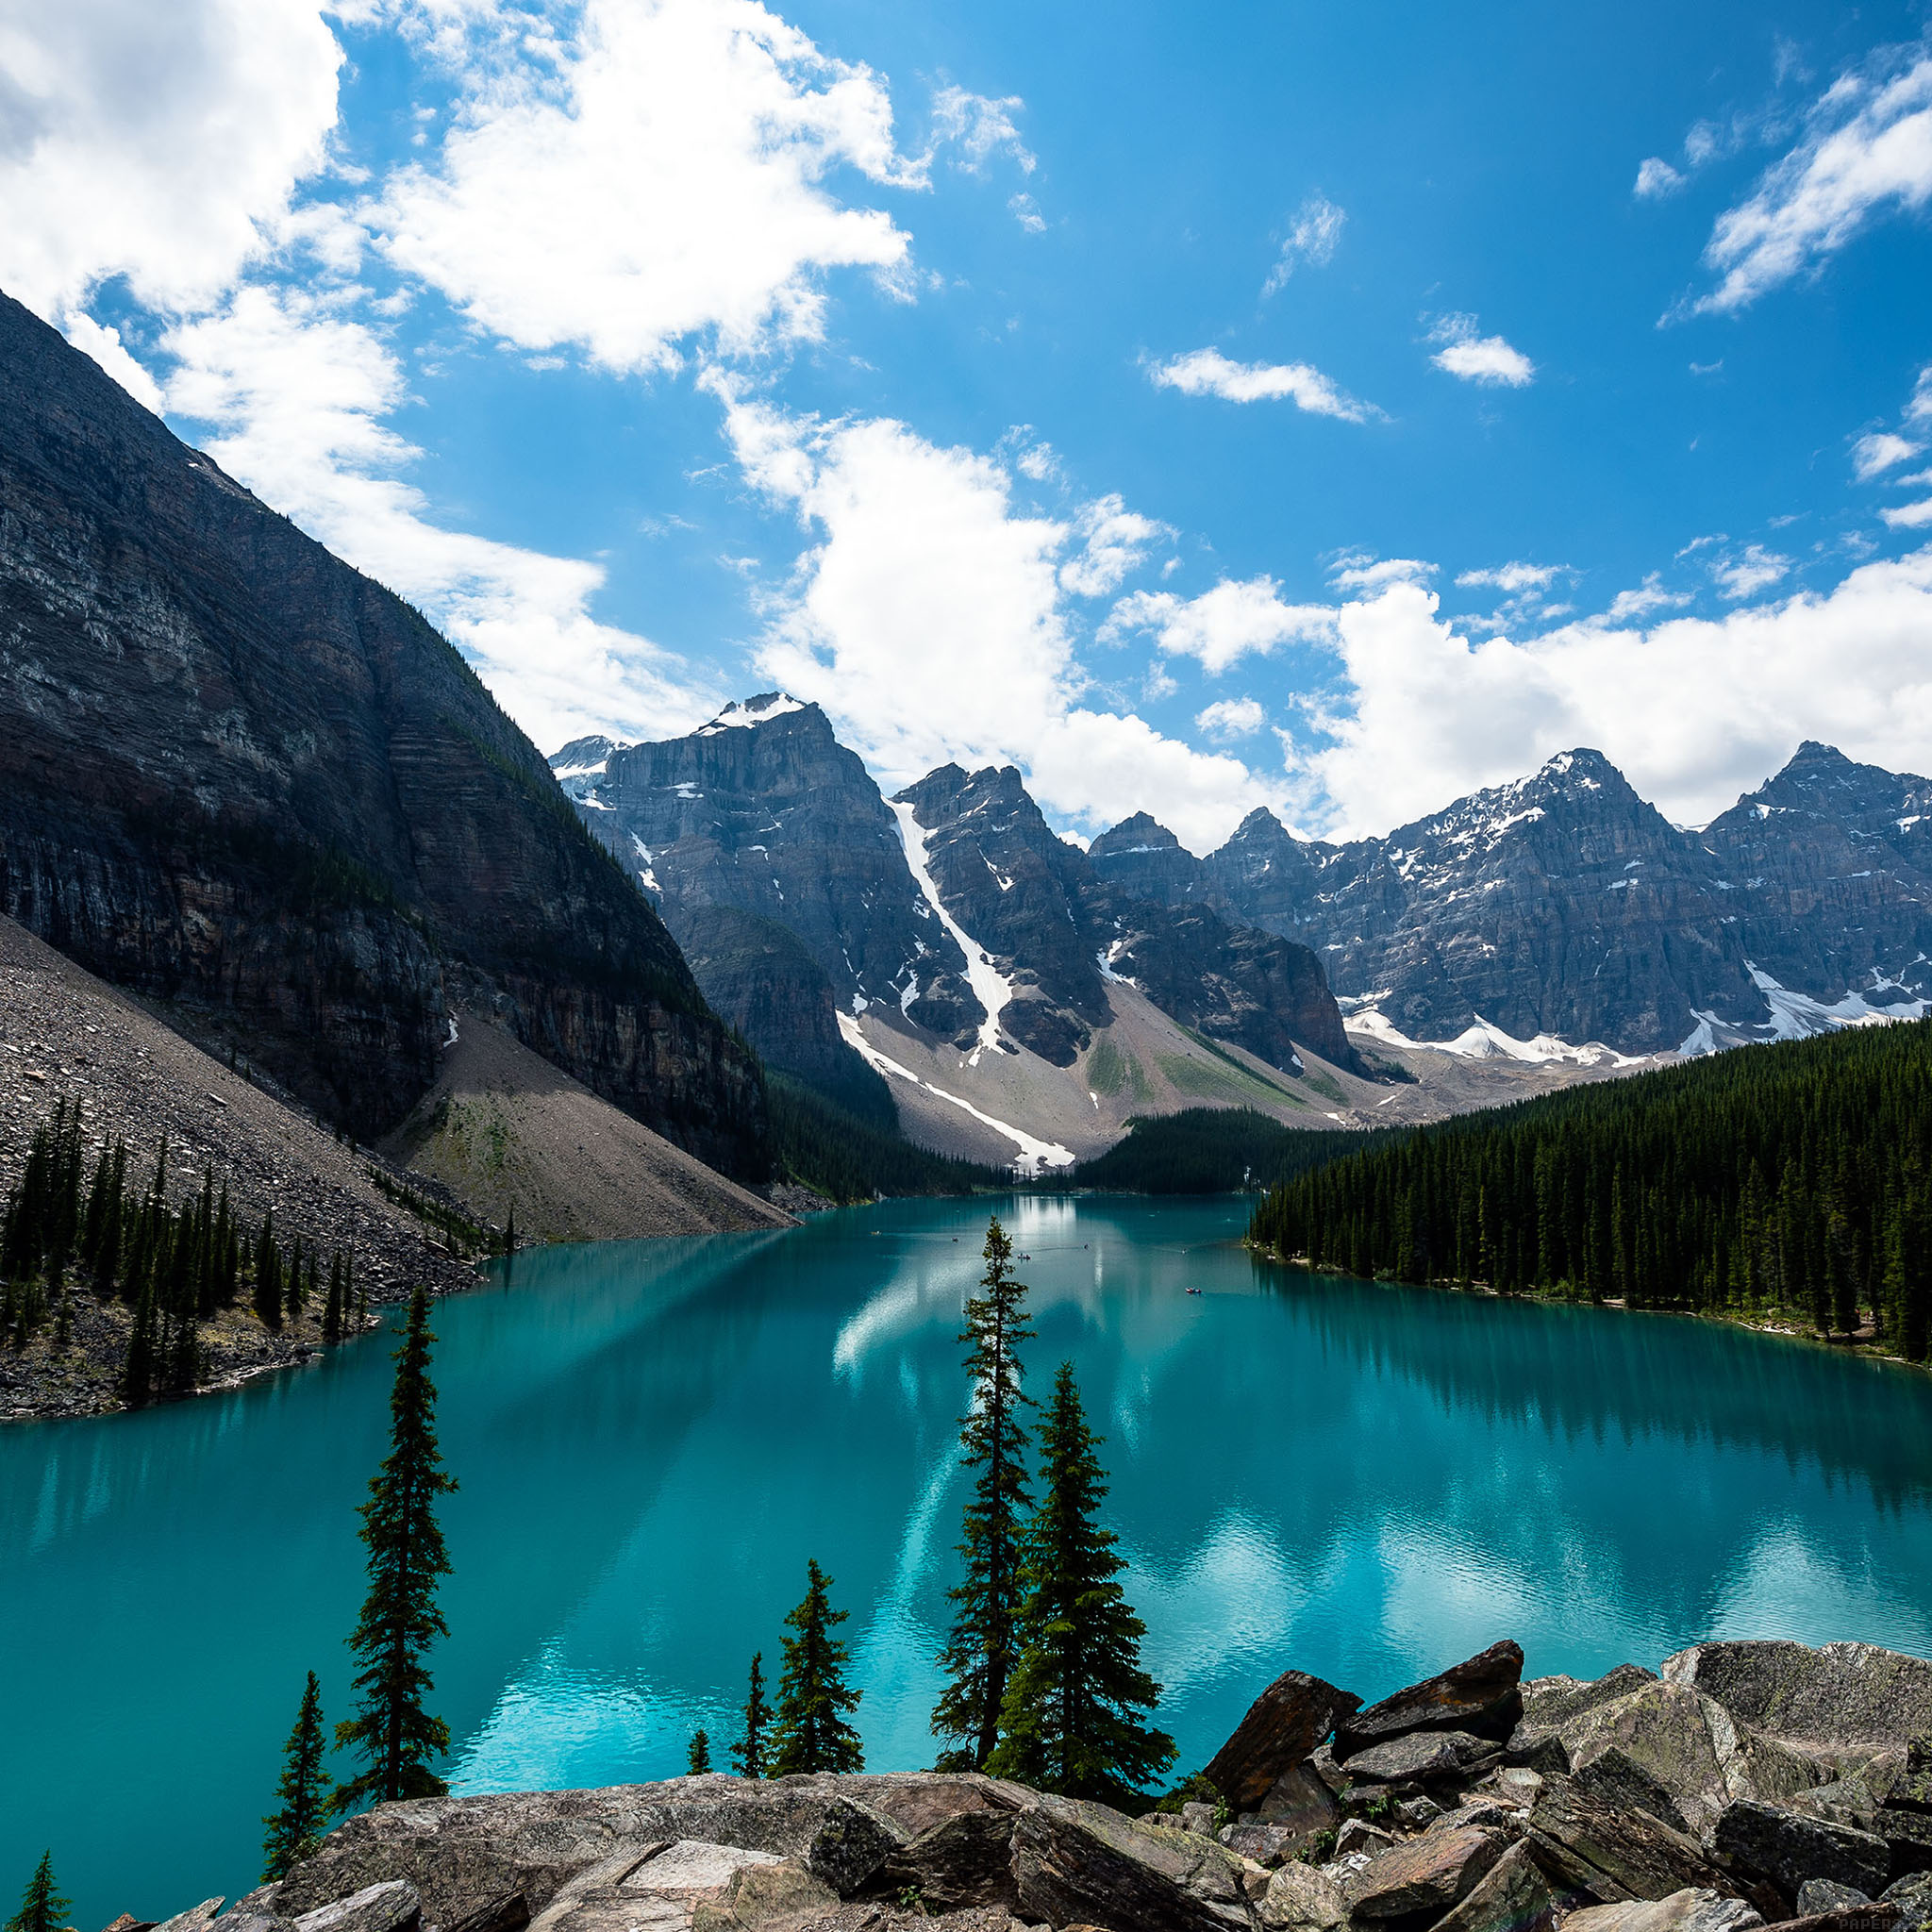 Mc33-wallpaper-emerald-lake-canada-mountain